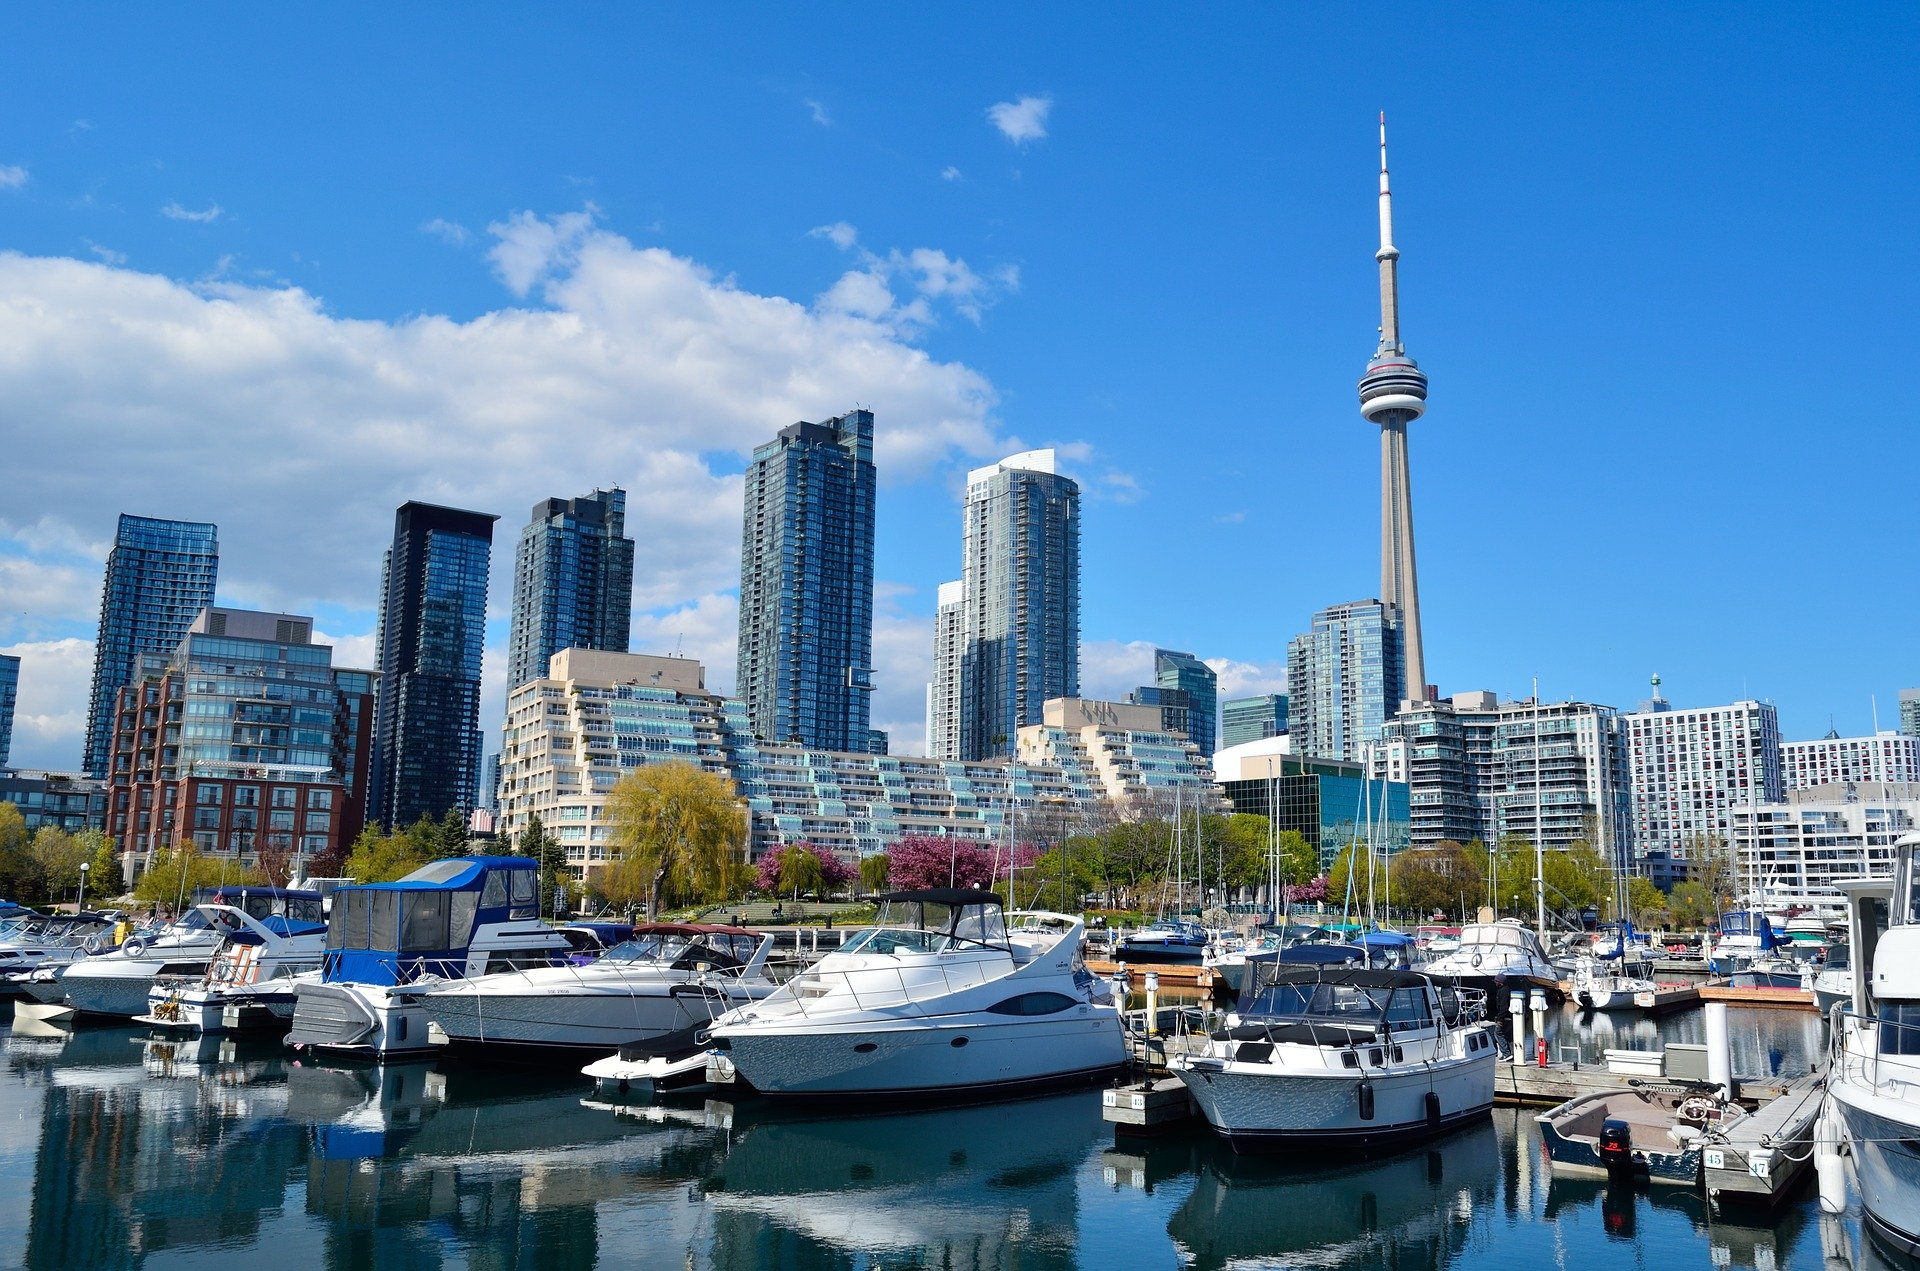 Canopy Rivers Toronto